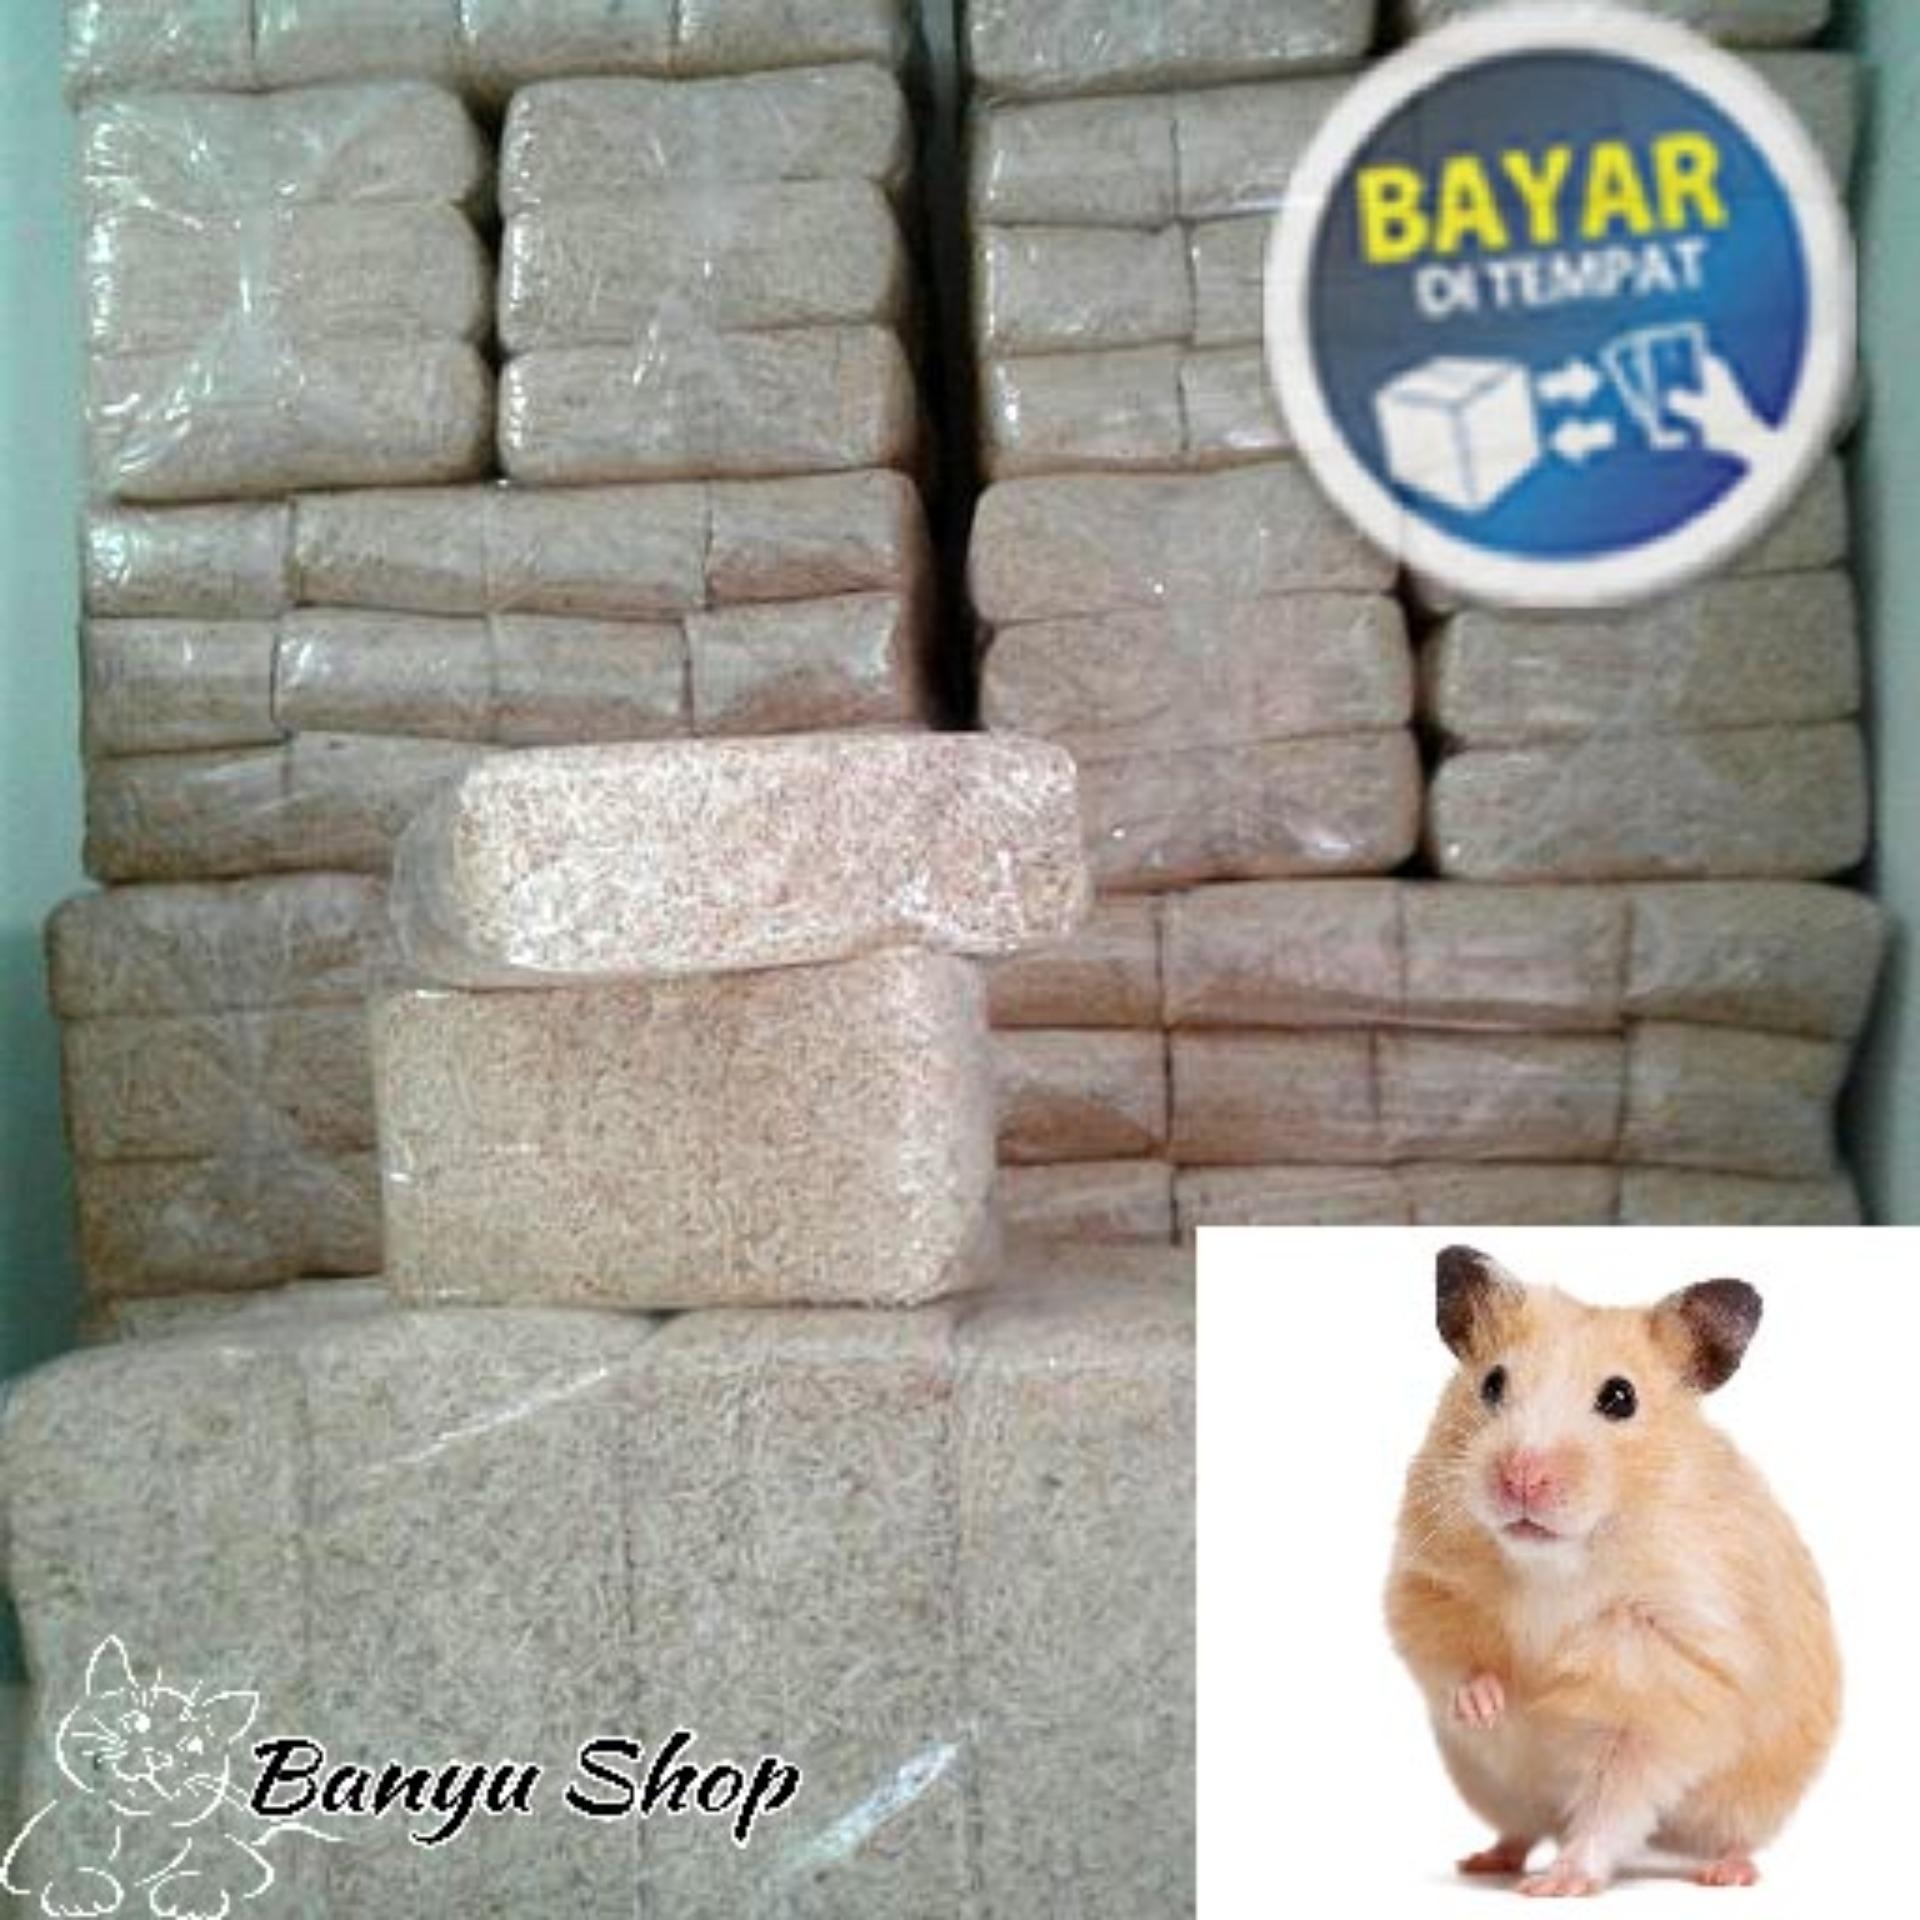 Serbuk Kayu kandang hamster 320gram(Alas/Beeding Untuk Hamster- Landak Mini- Sugar